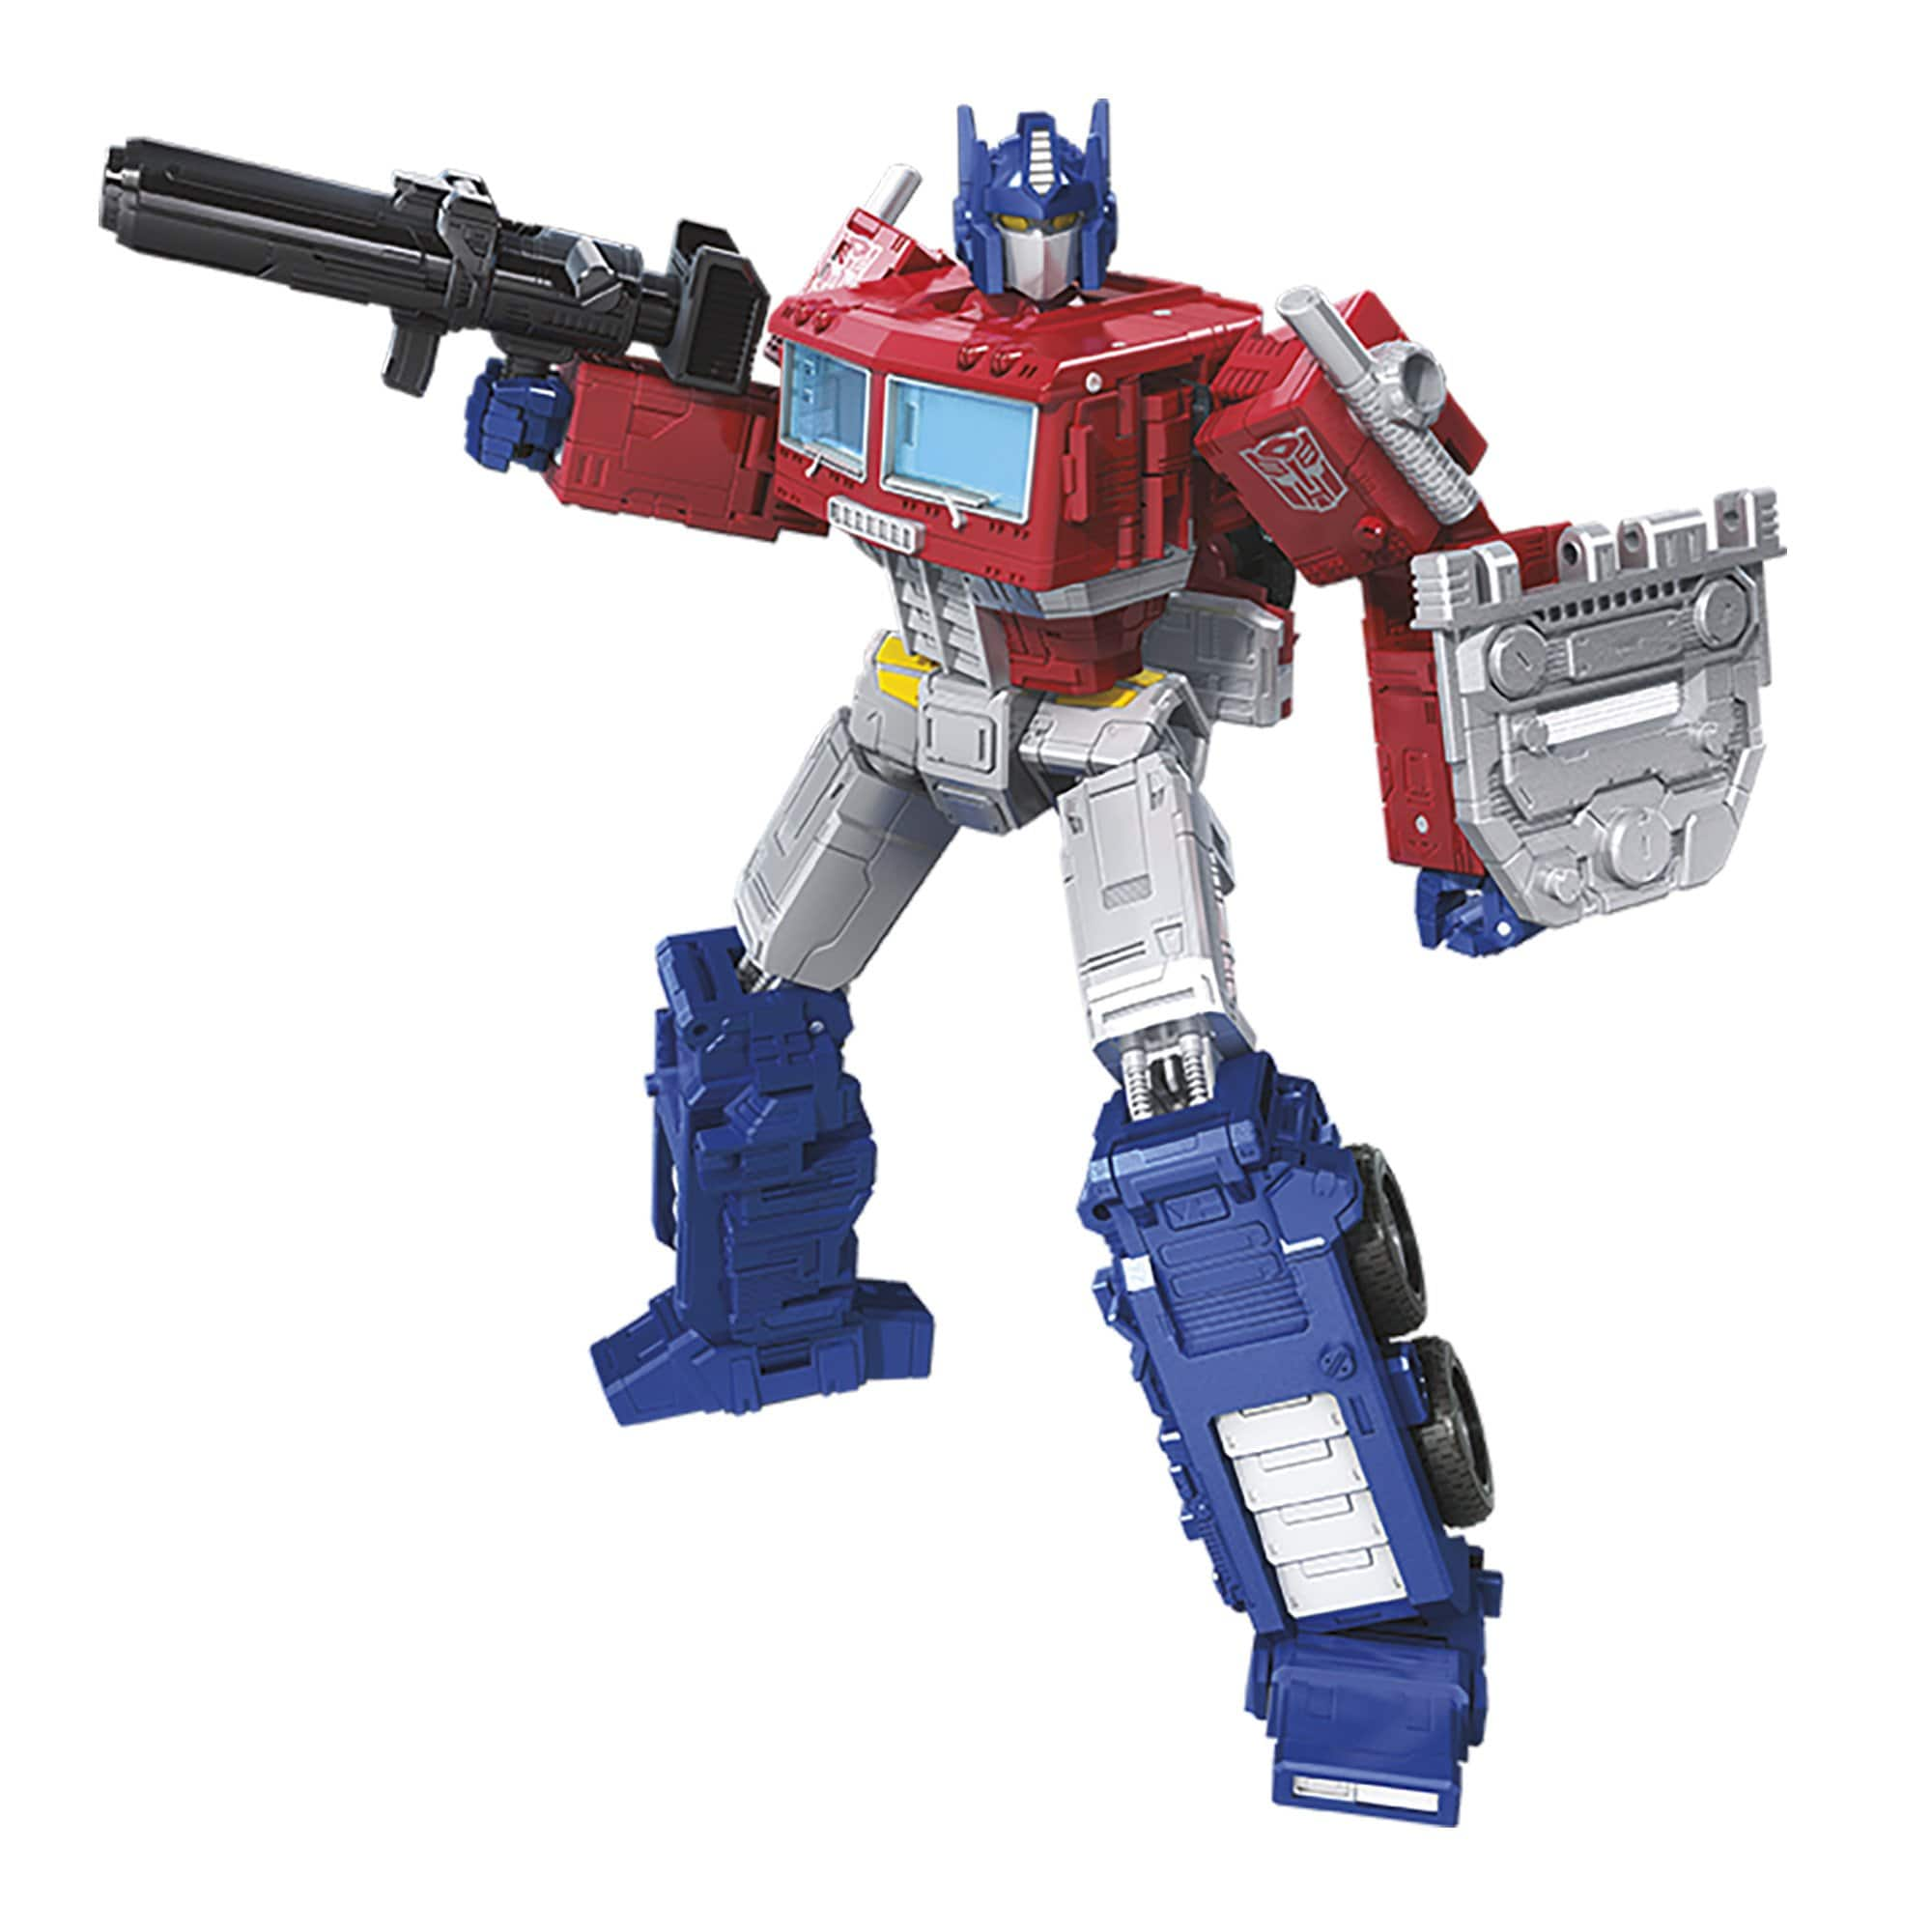 Transformers Earthrise Leader Class $20